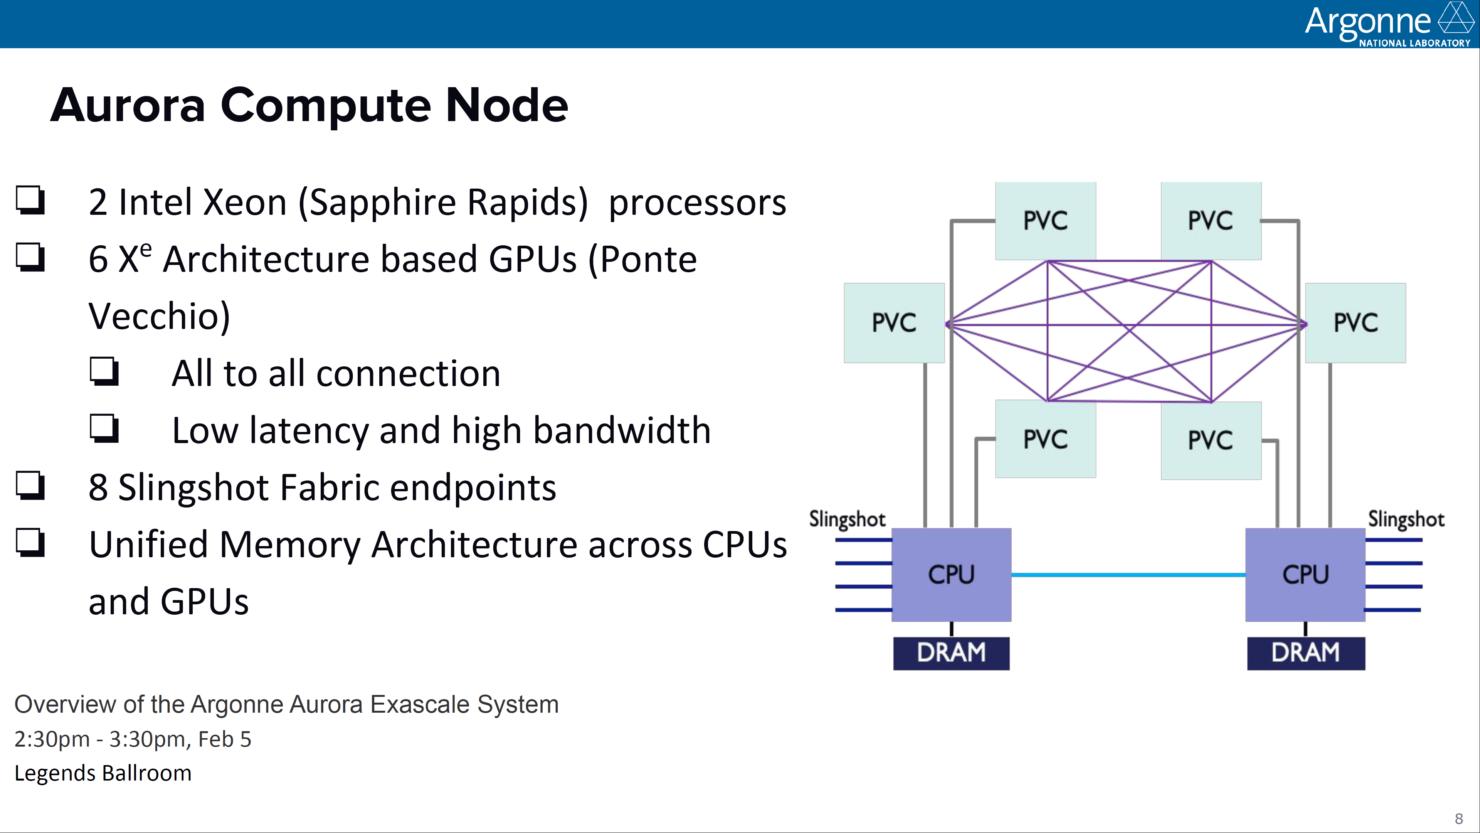 intel-aurora-supercomputer_xe-hpc-ponte-vecchio-7nm-gpu_sapphire-rapids-xeon-10nm-cpus_4